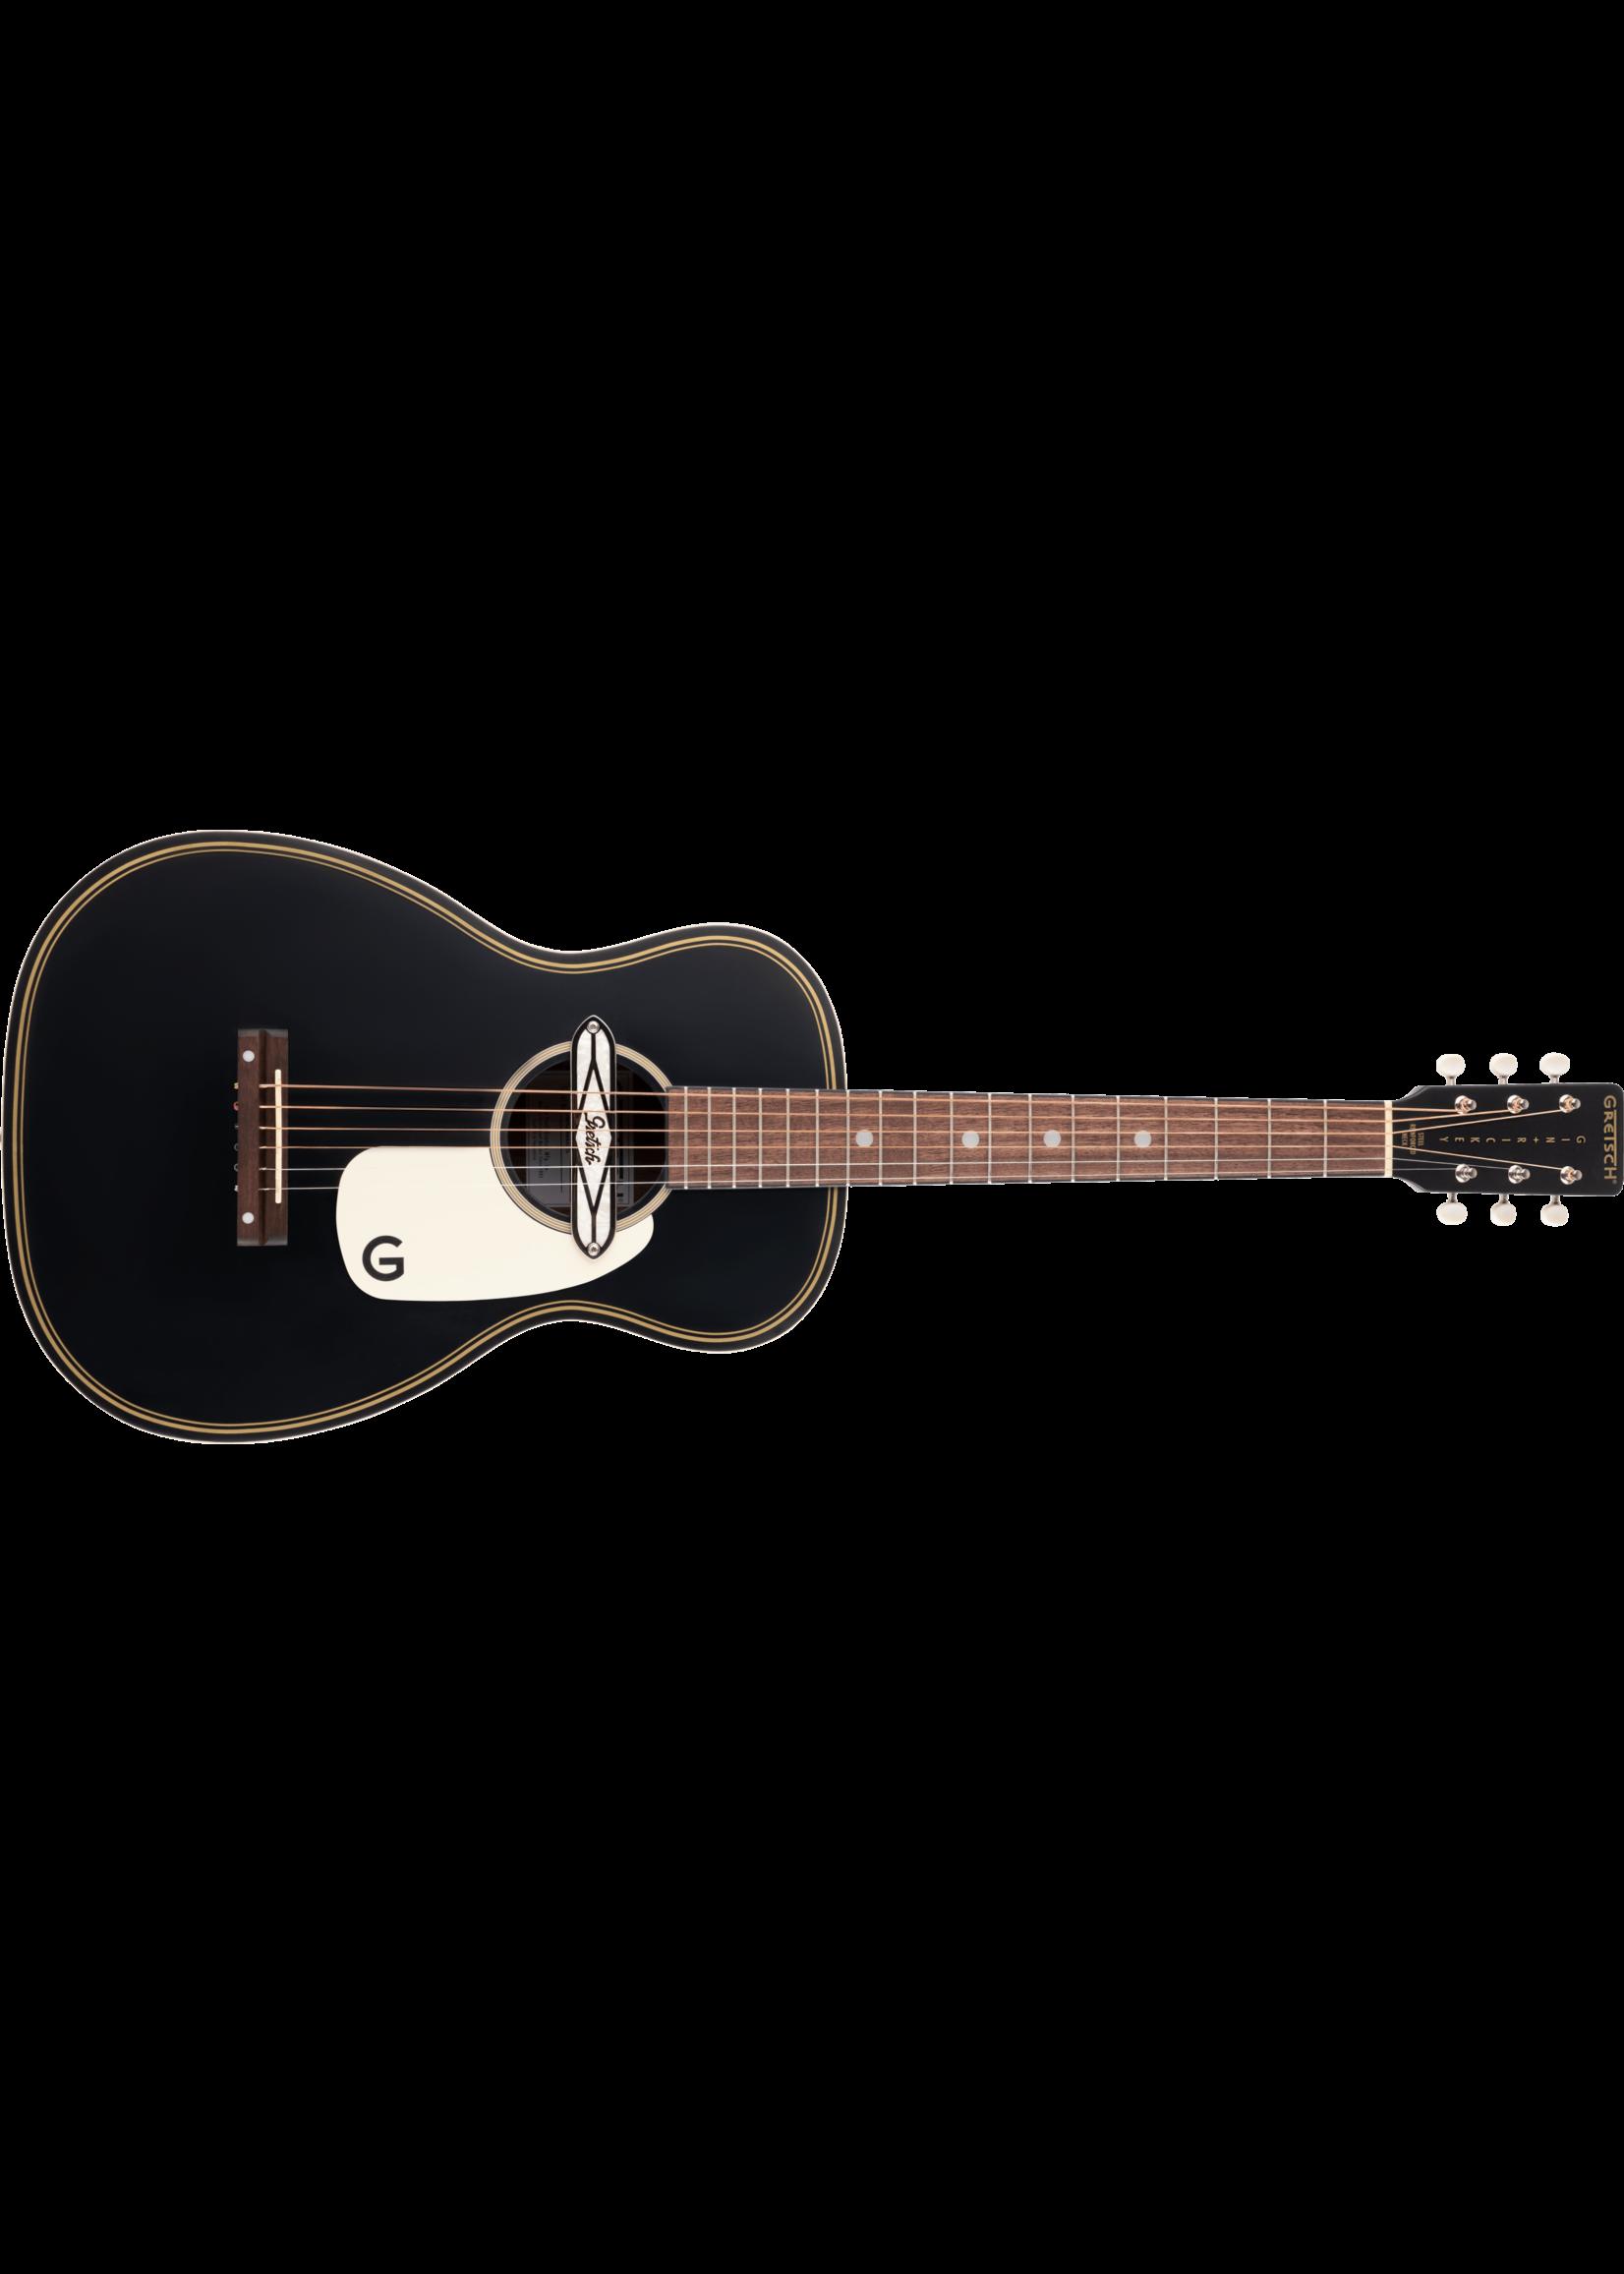 Gretsch Gretsch G9520E Gin Rickey Acoustic/Electric Black